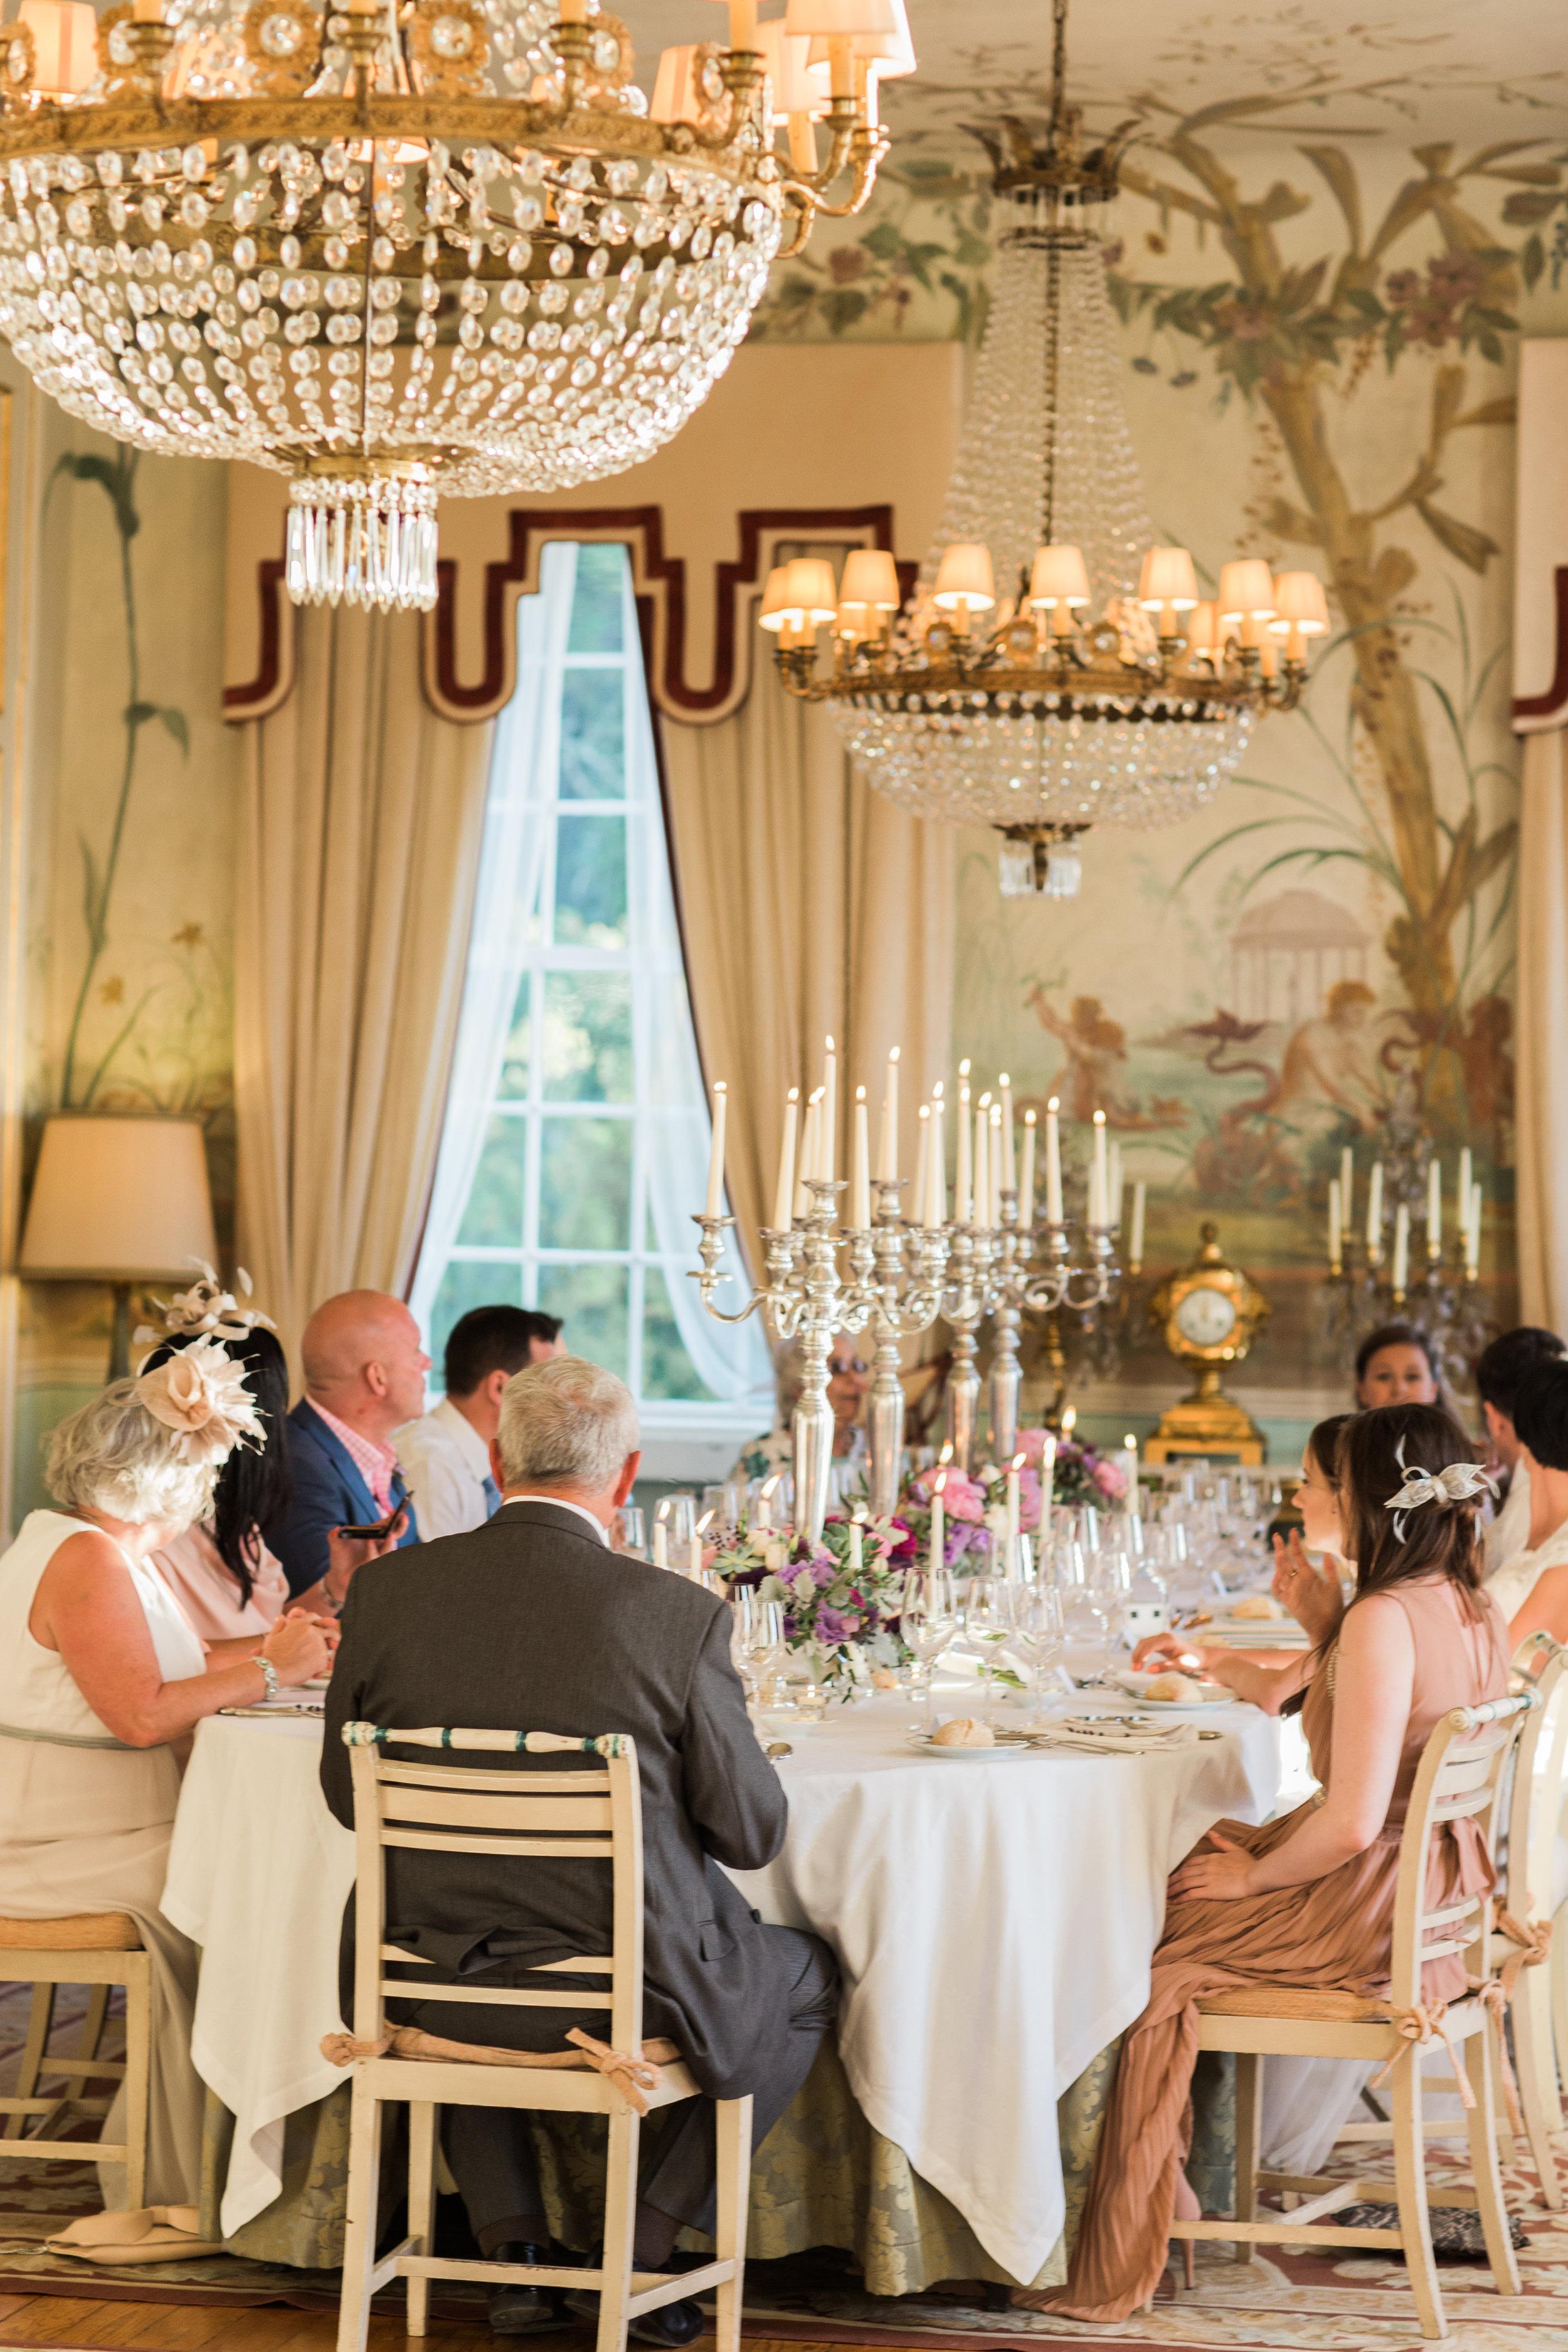 49 mariarao-wedding-palacio-seteais-299.jpg